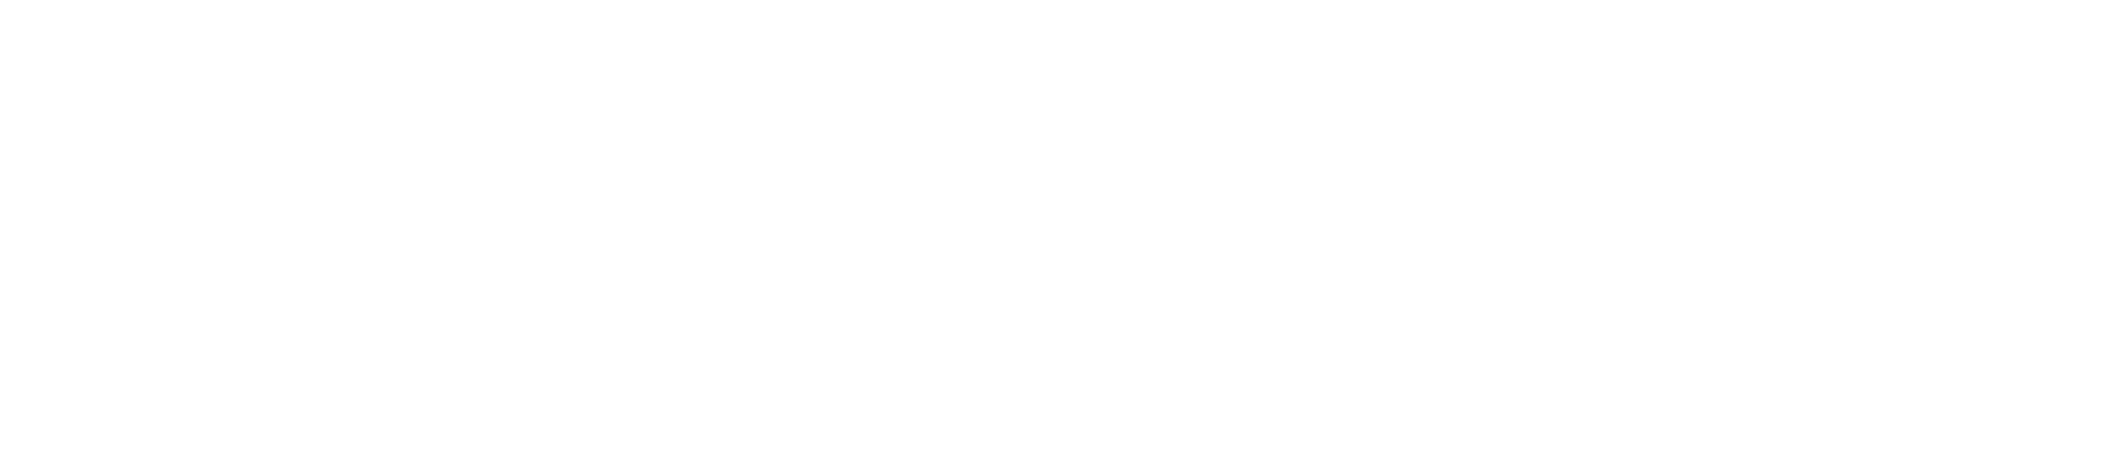 Skysthelimit Mentorship Program Logo in White PNG